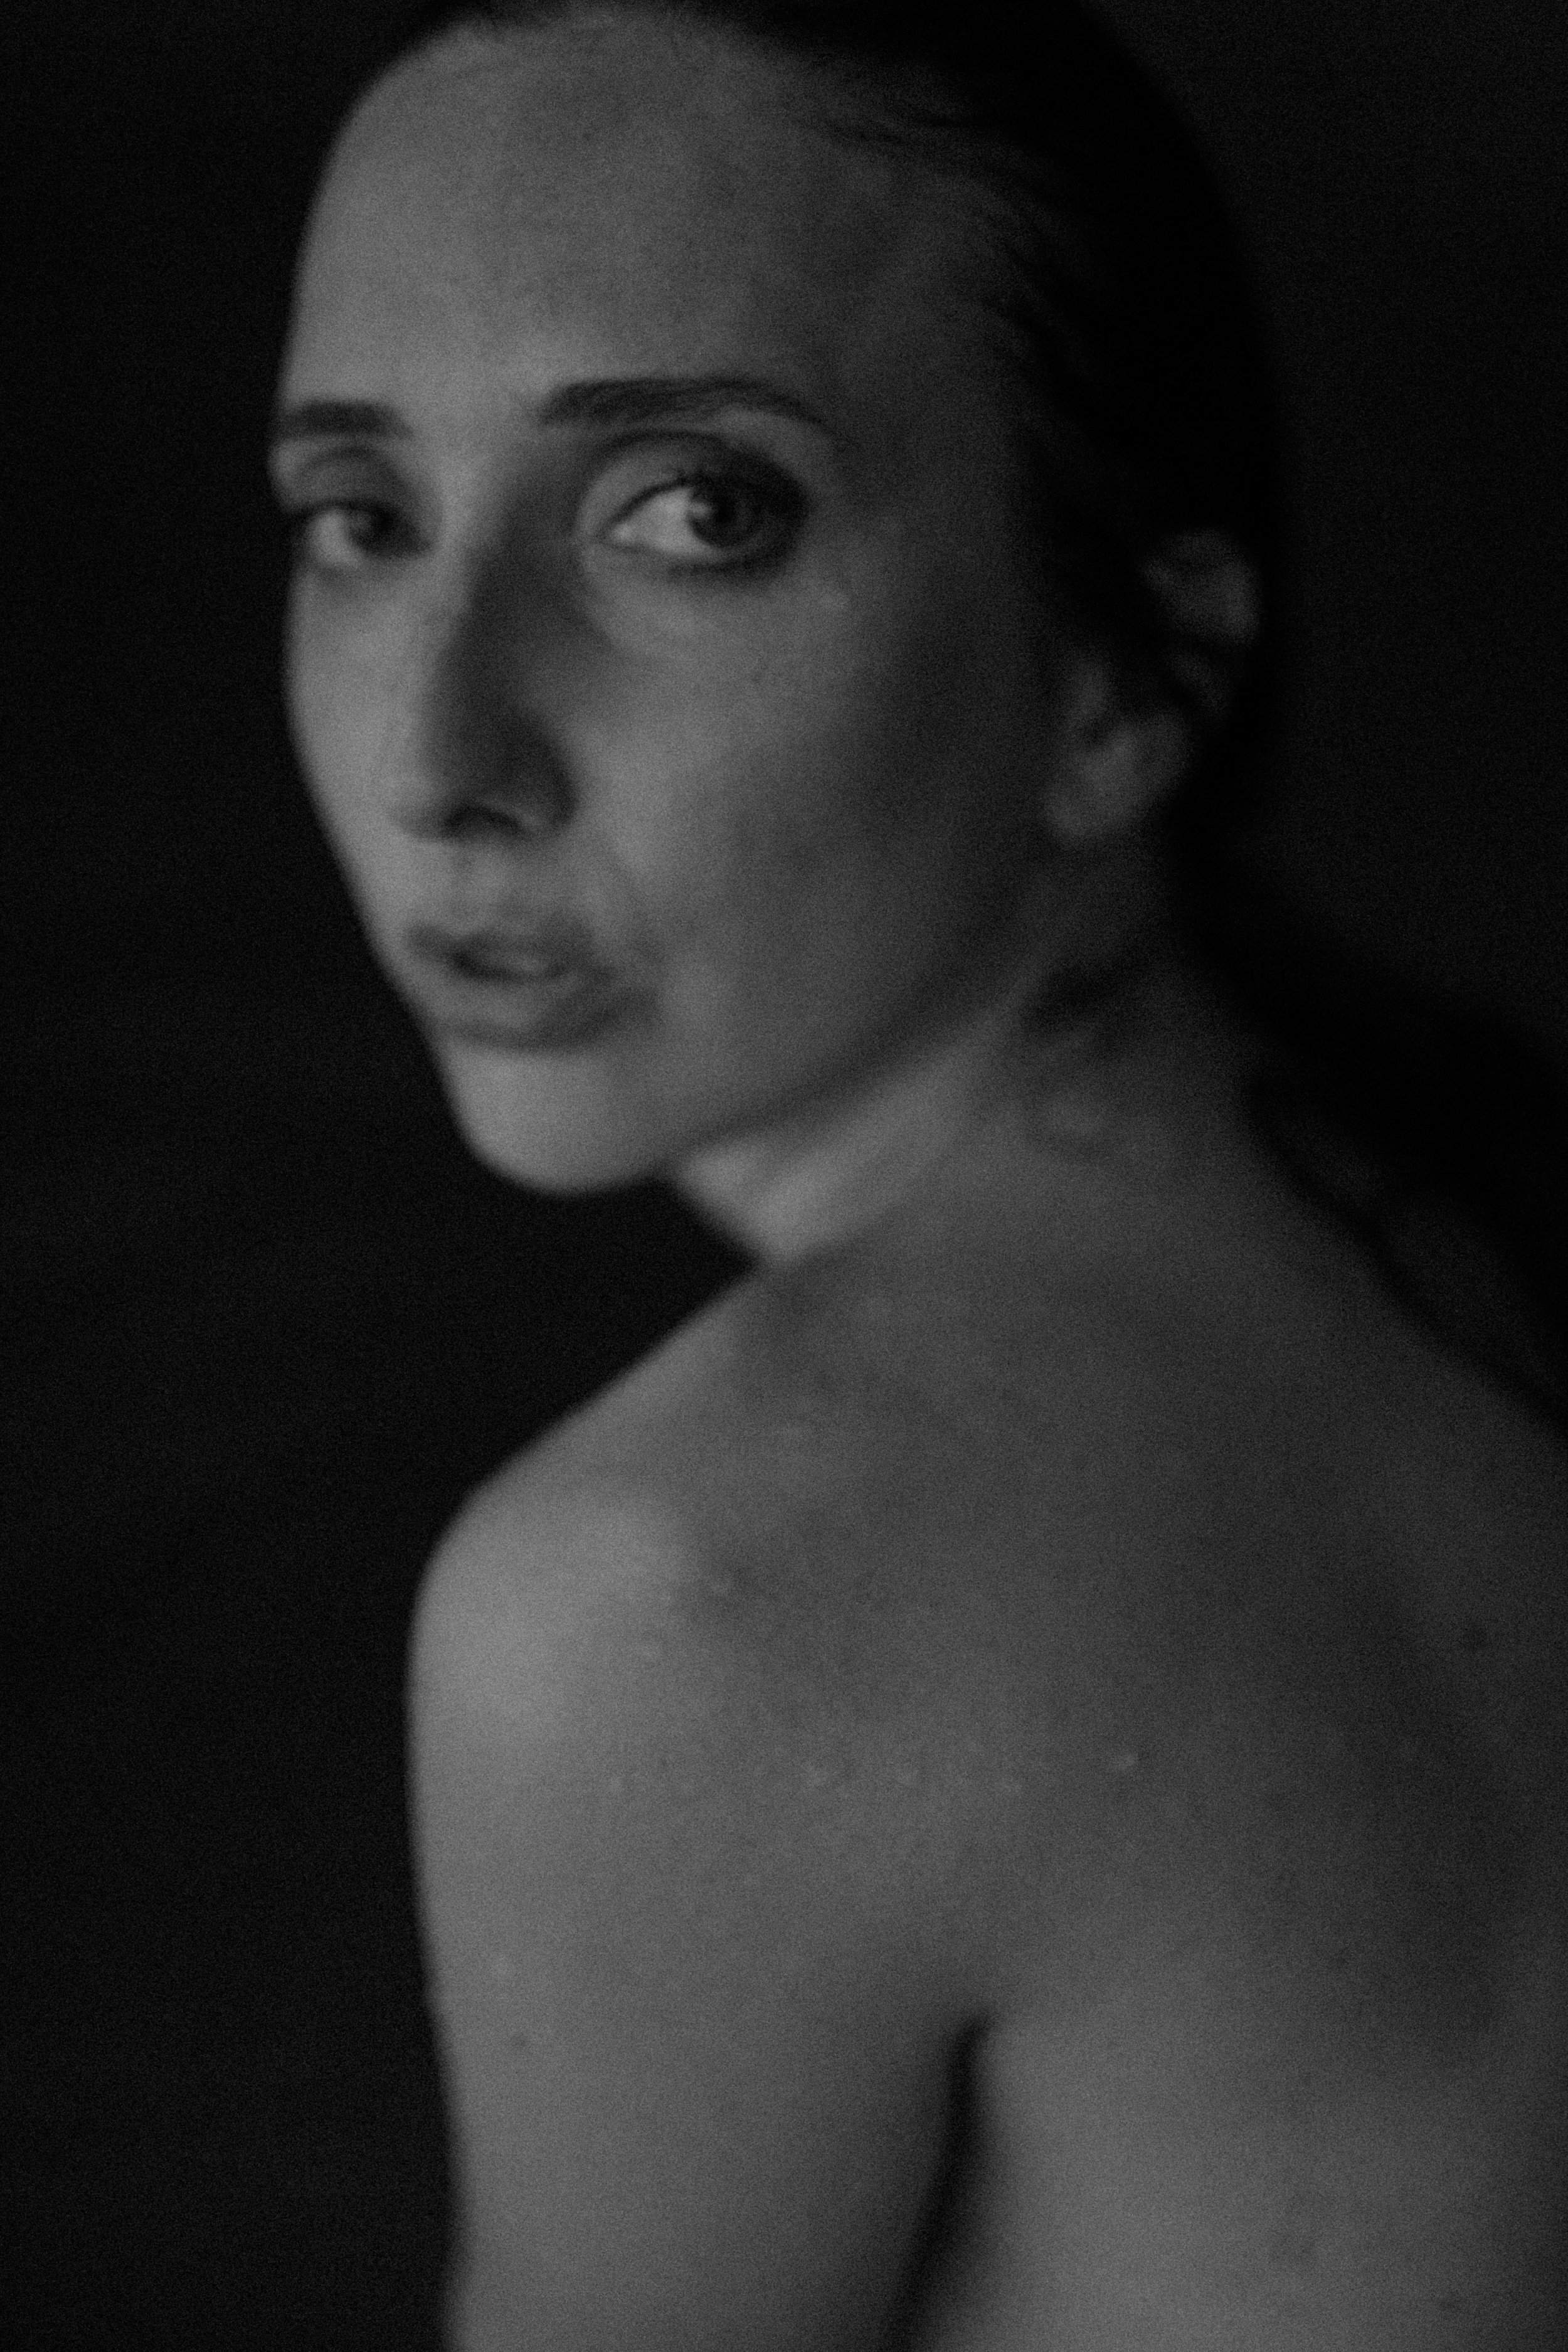 outdoor boudoir. boudoir inspiration. underwater nude. black and white portrait. underwater boudoir. art model. anoushanou. ohio boudoir photographer. sarah rose photography. i am sarah rose.